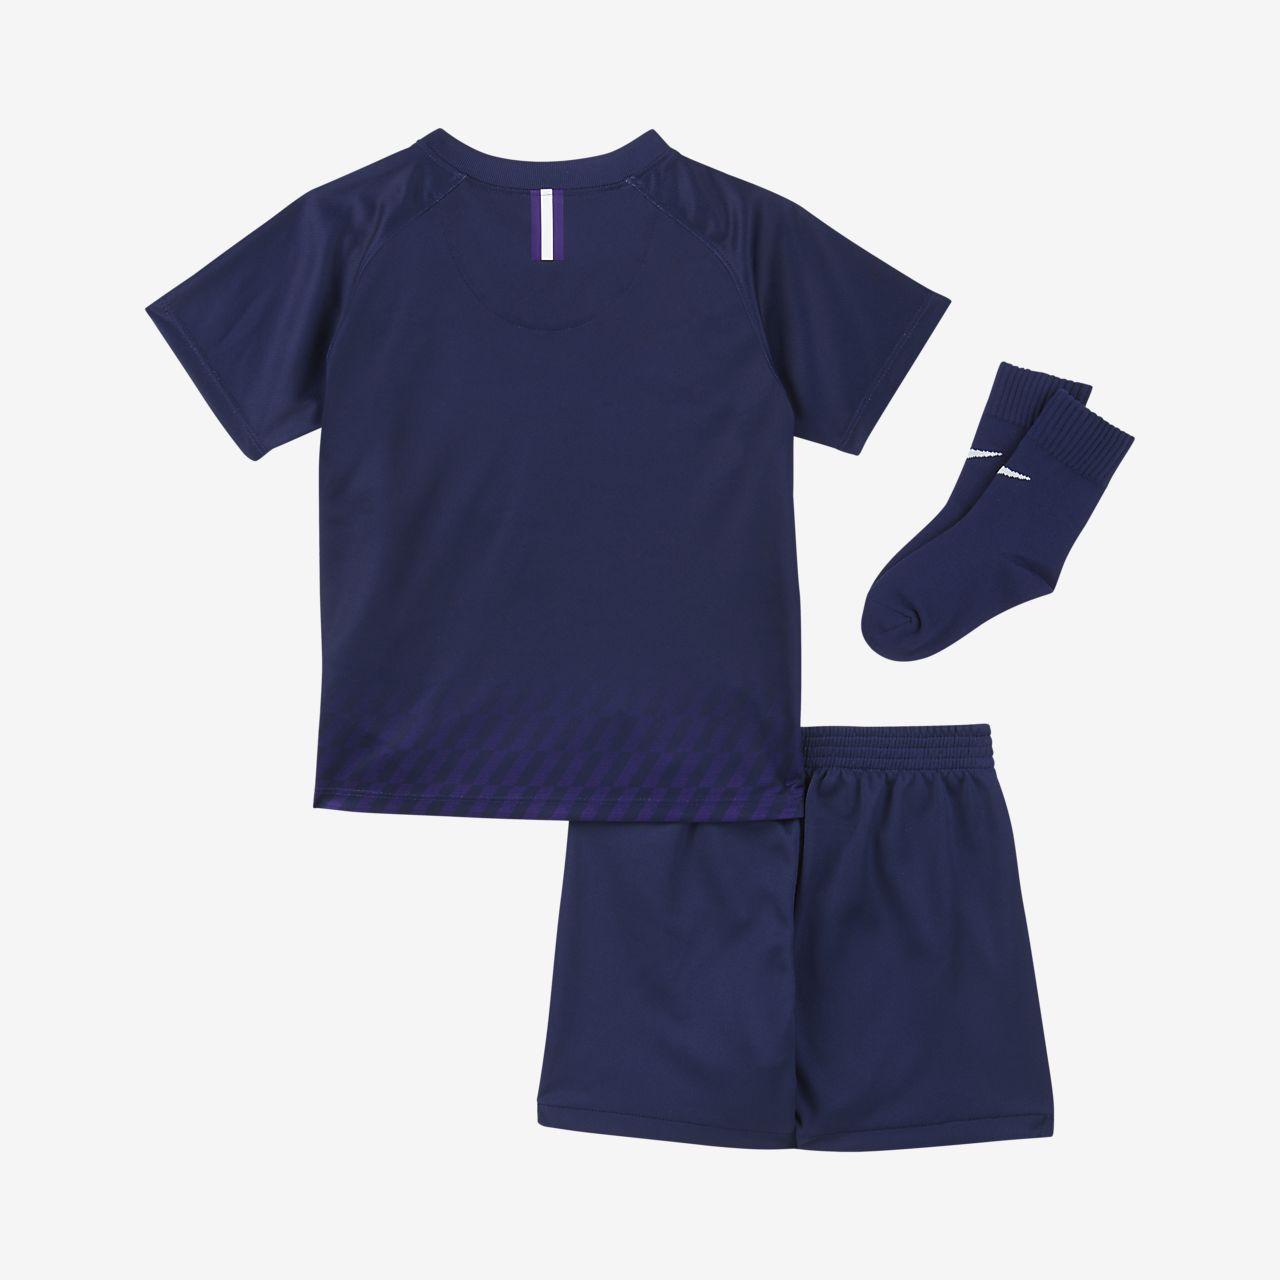 sneakers for cheap 6df66 1ac41 Tottenham Hotspur 2019/20 Away Baby & Toddler Football Kit